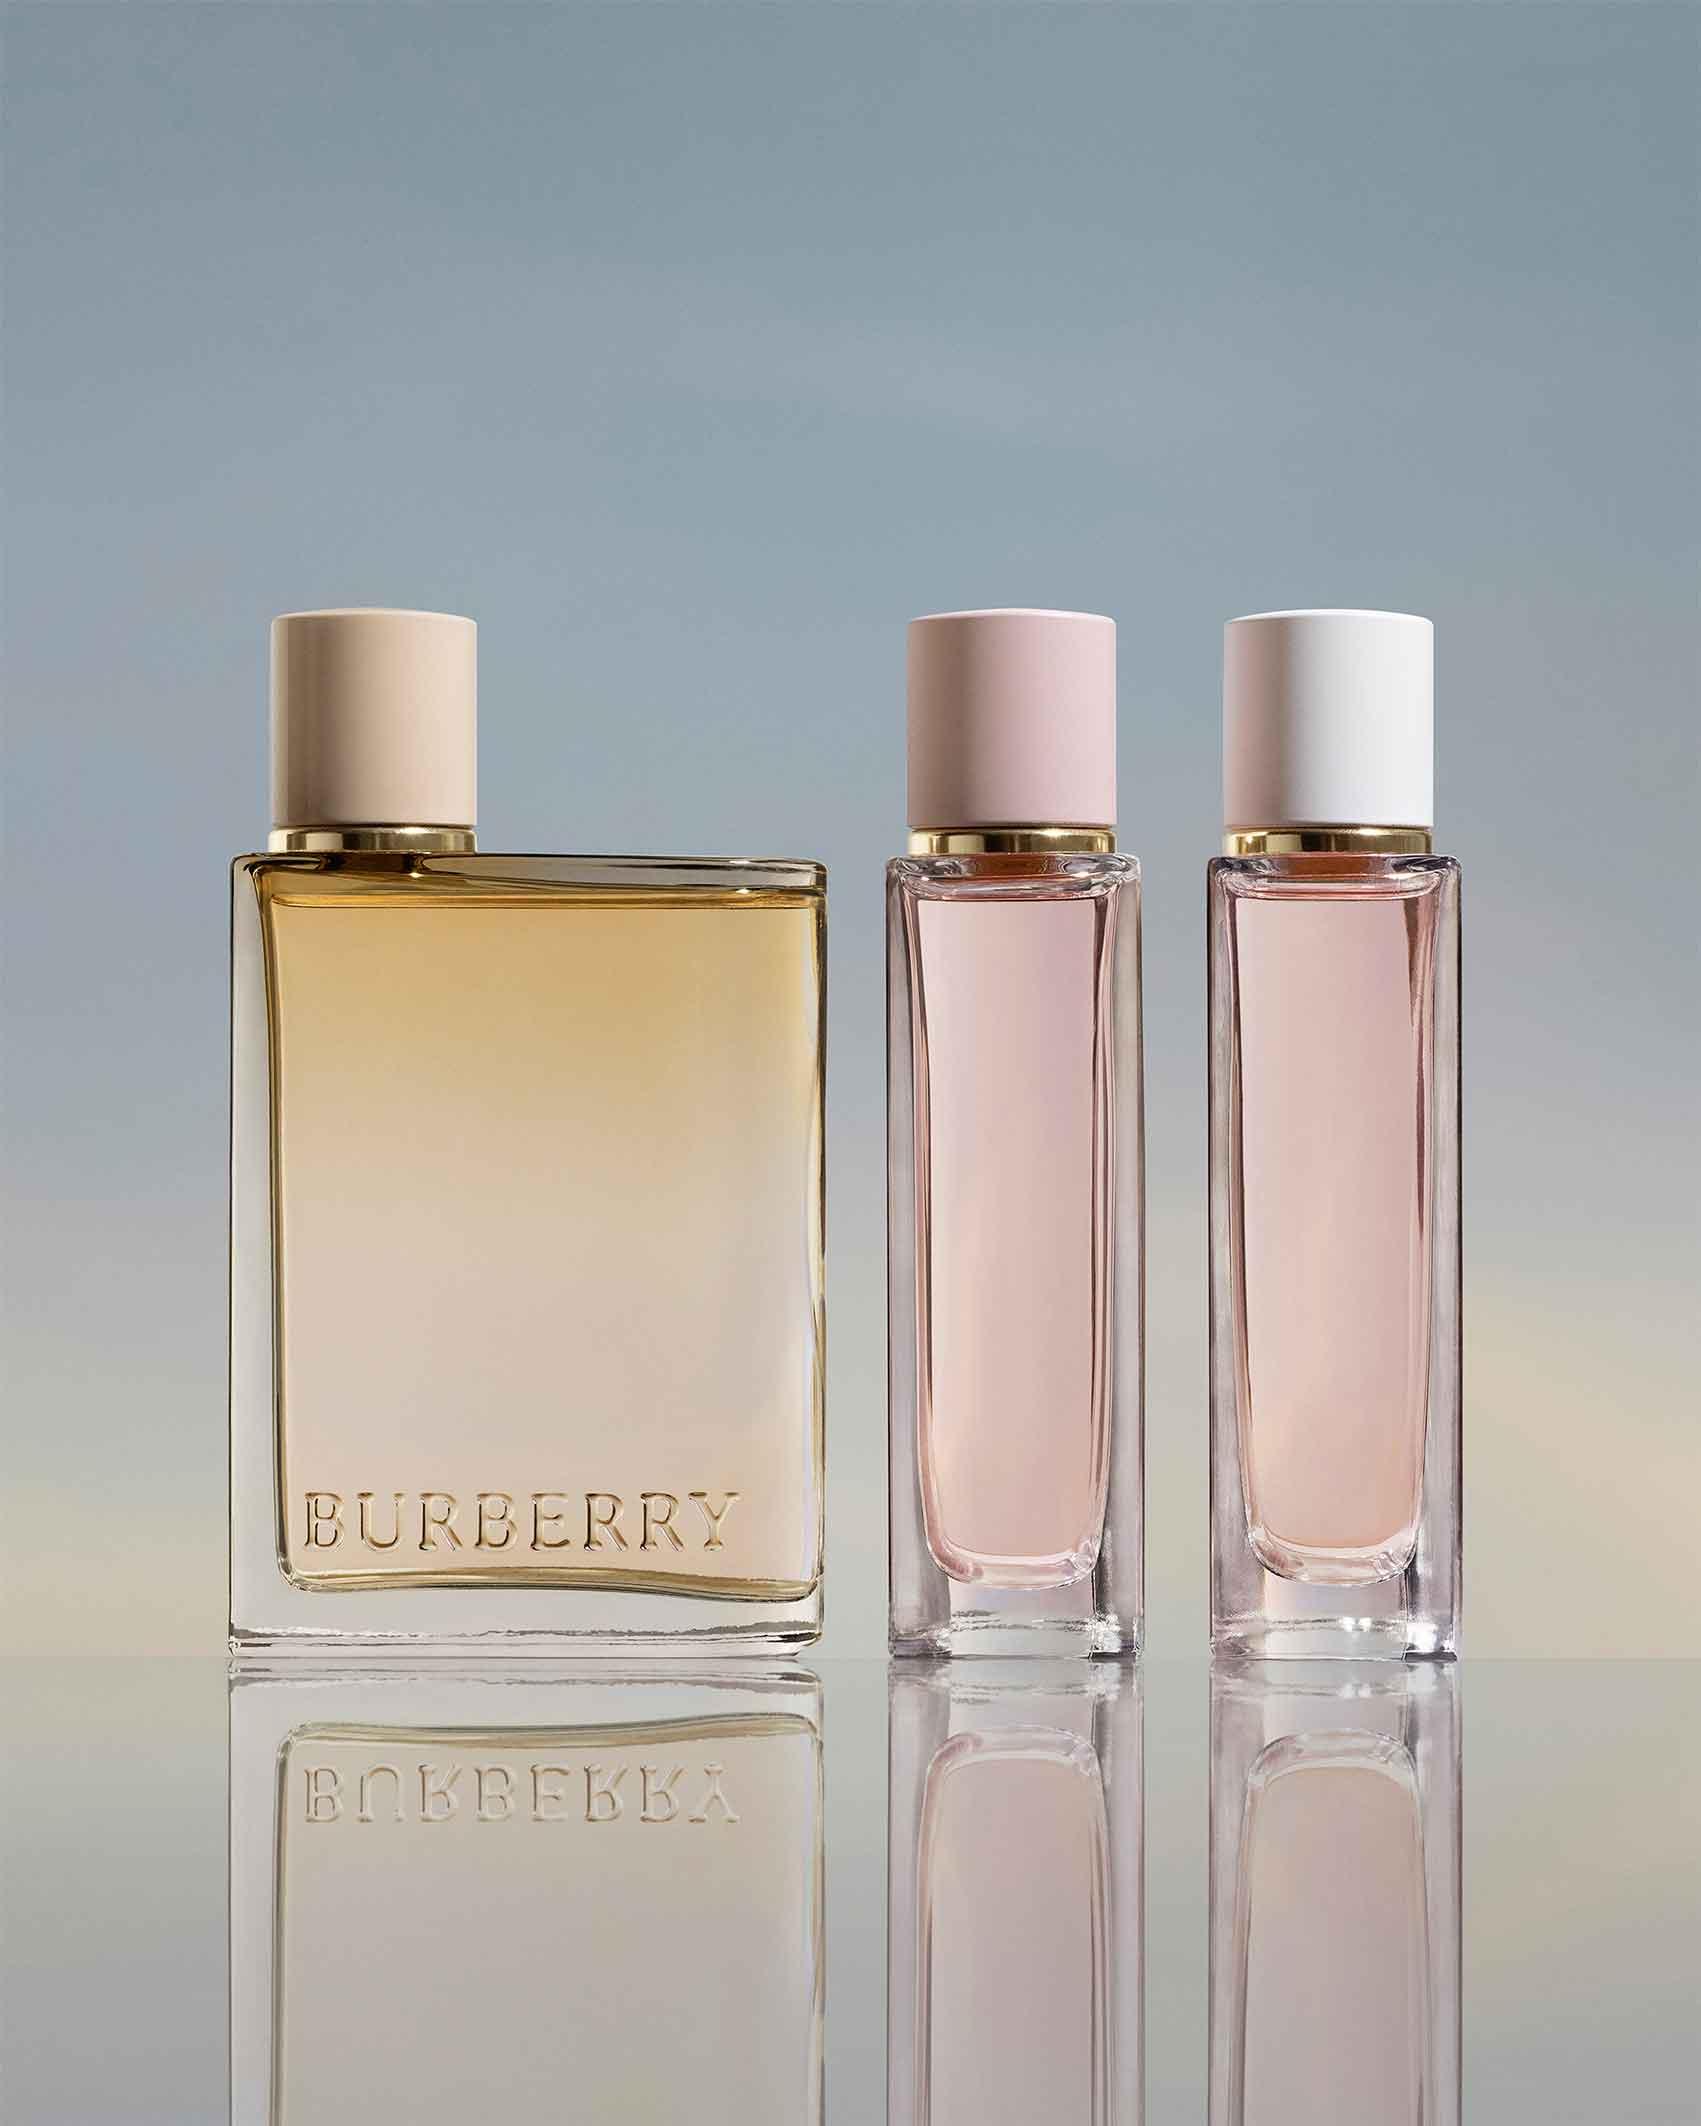 BURBERRY INTENSE EDP-אופנה-בושם-לאישה-פרפיום